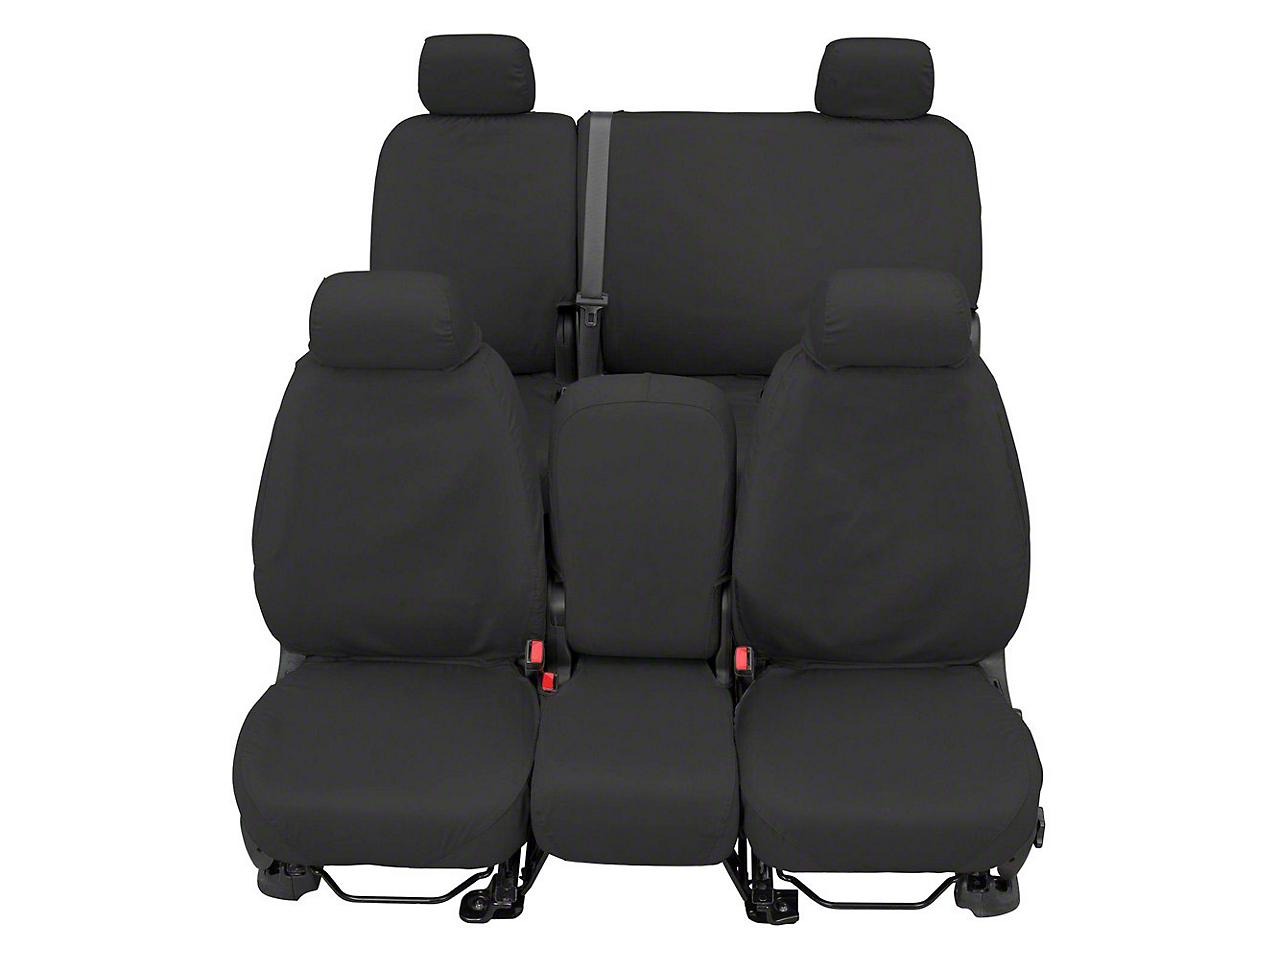 Covercraft Front Row SeatSaver Seat Covers - Waterproof Gray (07-18 Sierra 1500 w/ Bench Seat)